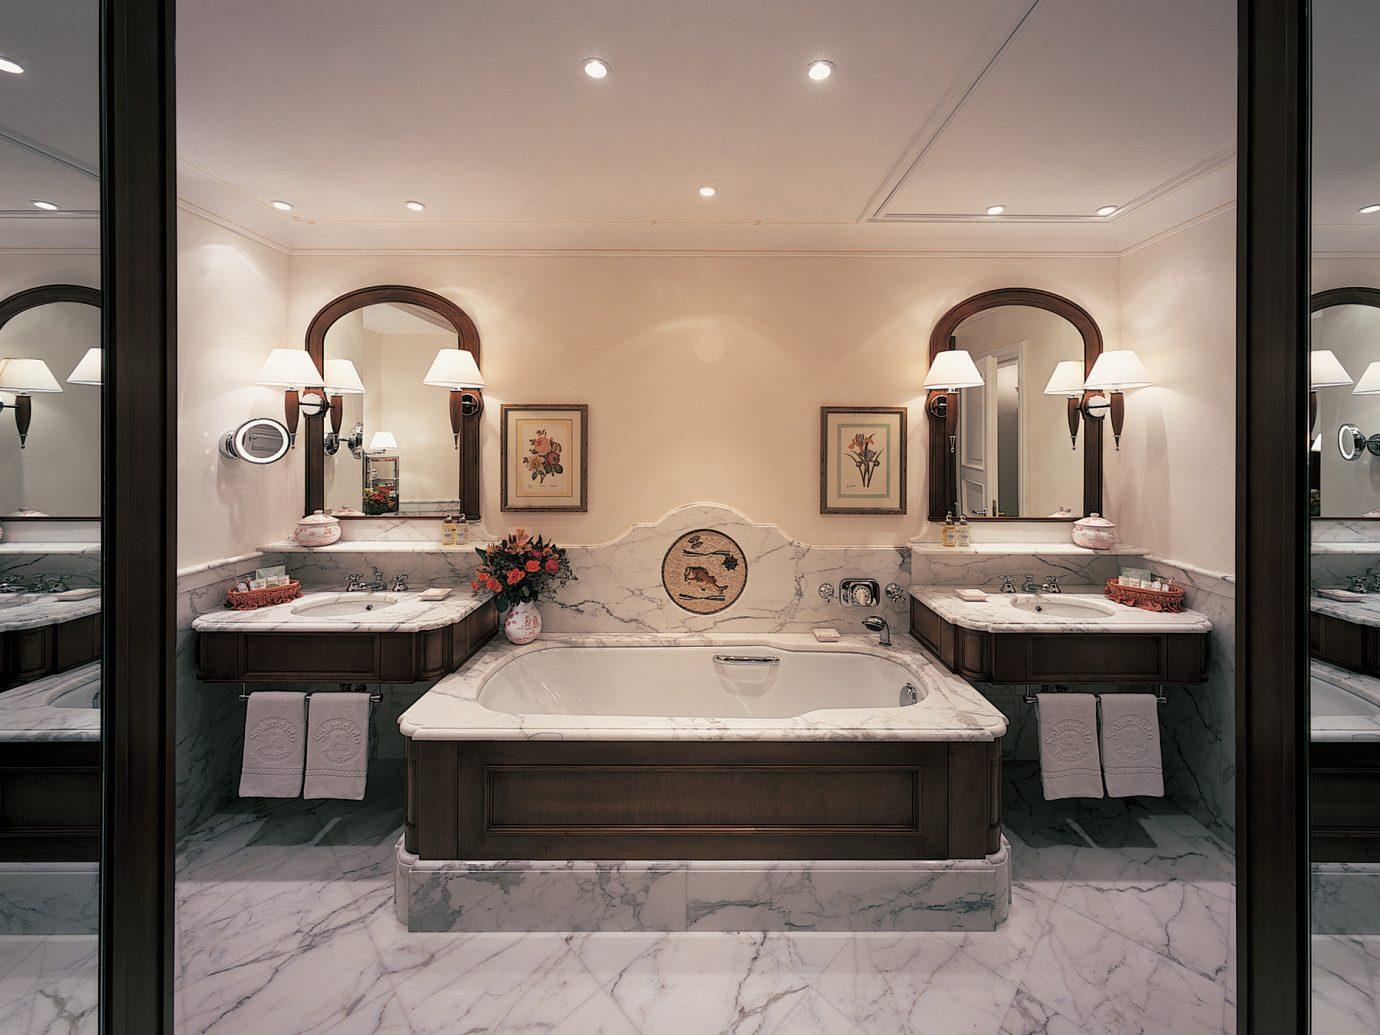 Italy Trip Ideas wall indoor room interior design bathroom ceiling floor sink flooring countertop estate interior designer Suite toilet